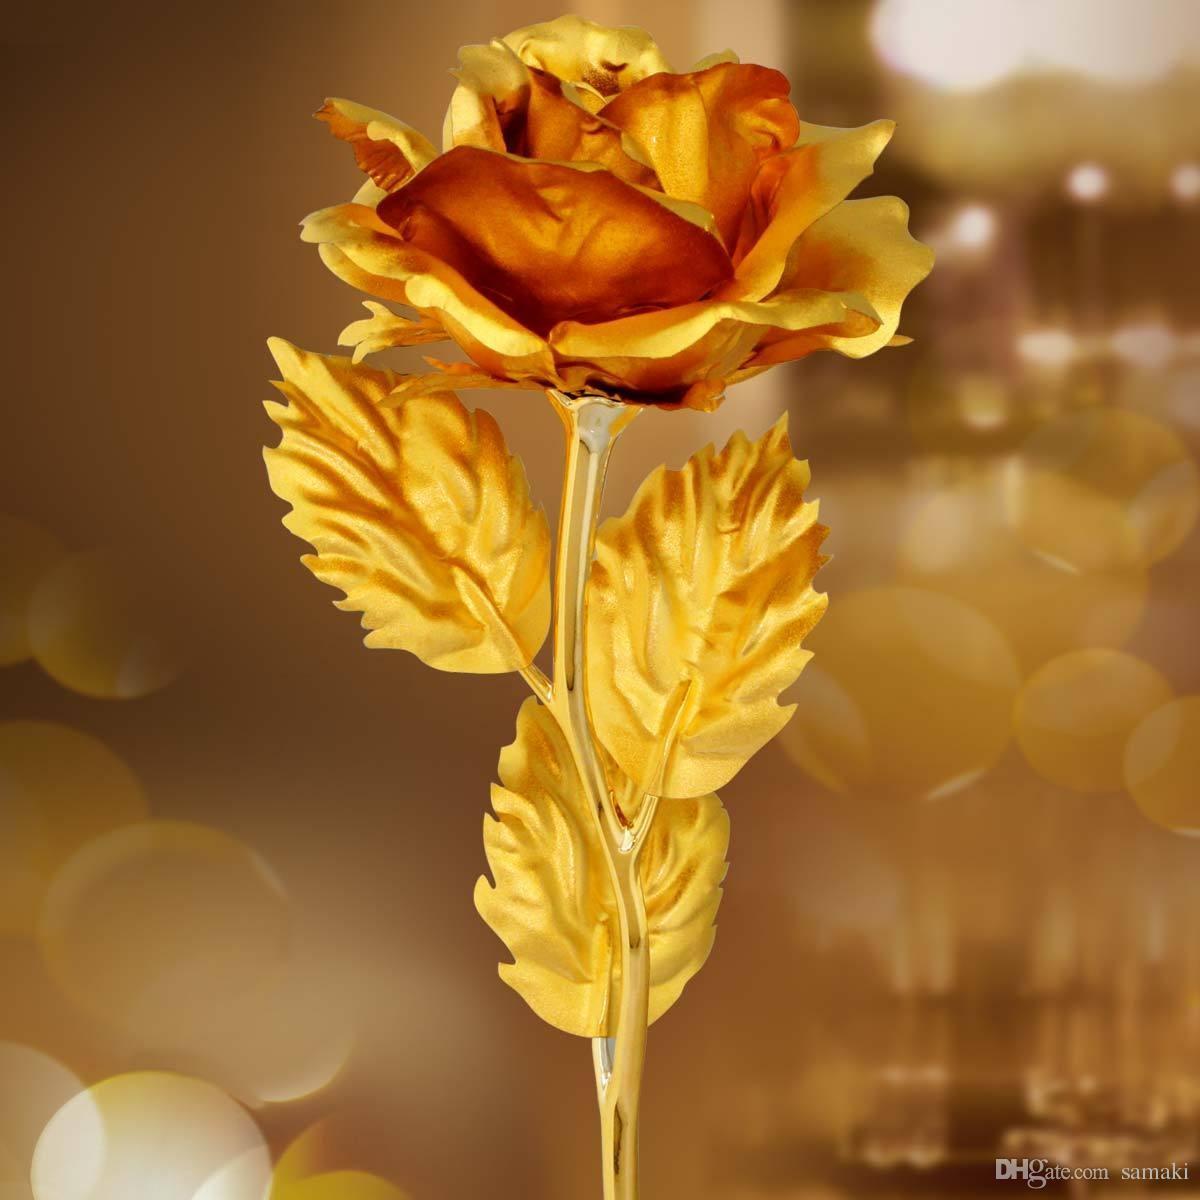 2018 Golden Rose For Valentine Day Artificial Flower Love